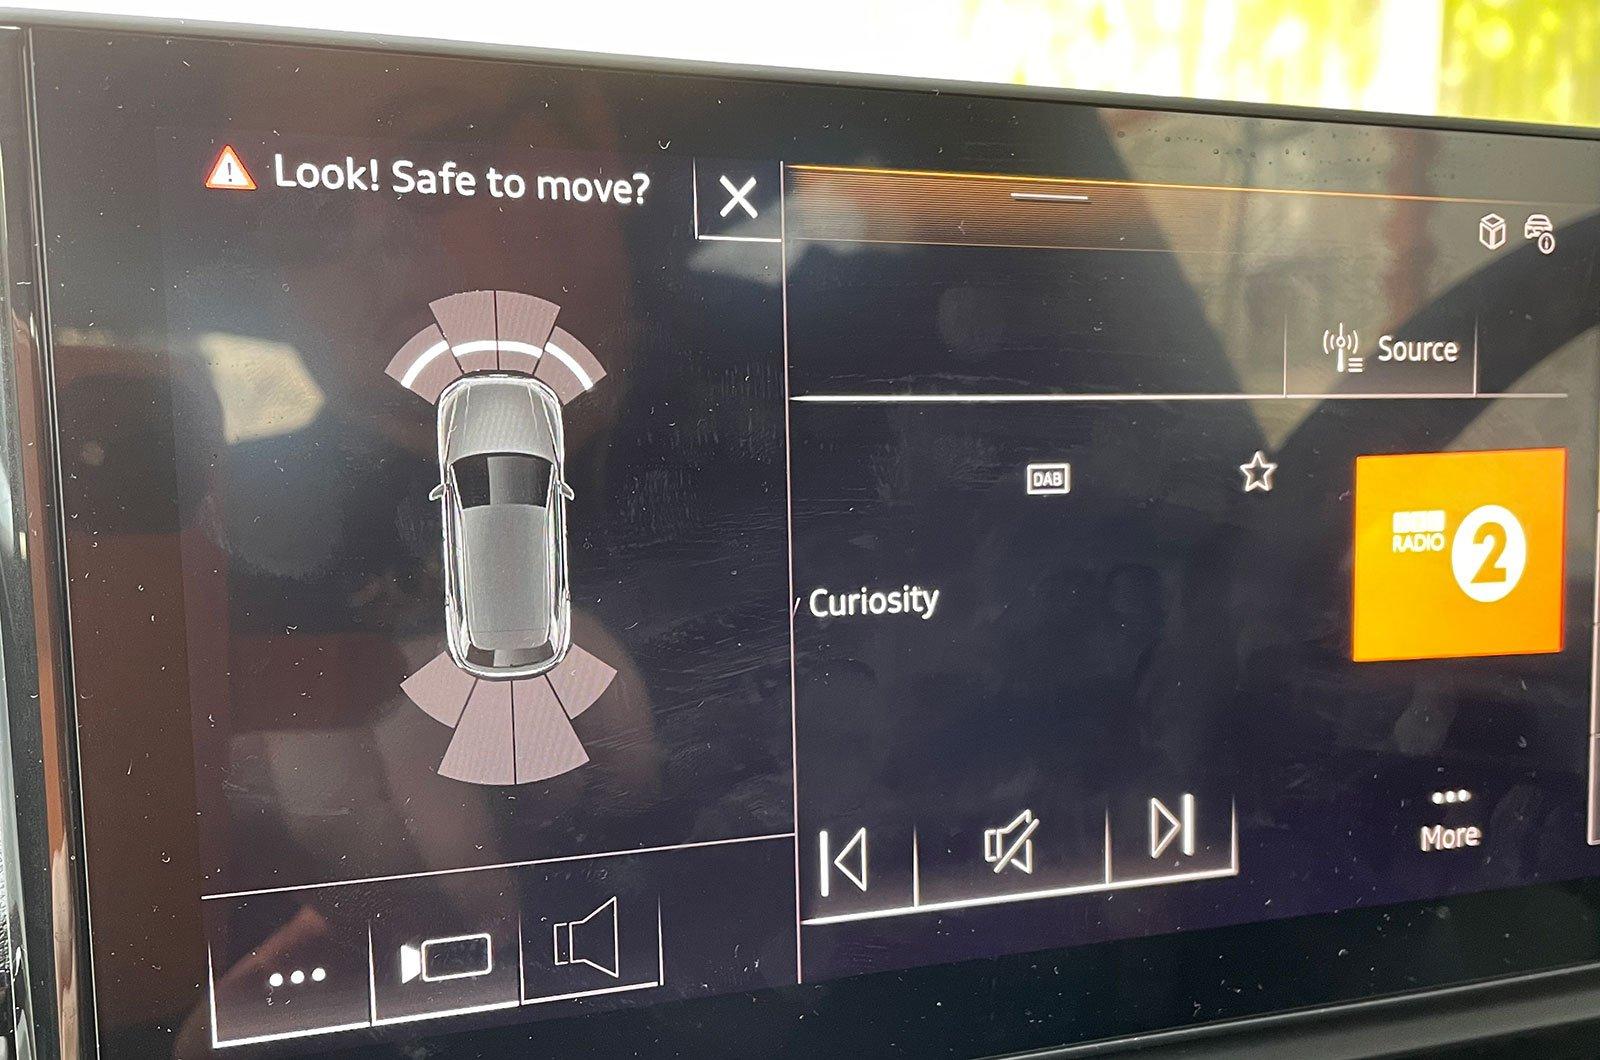 Audi Q5 infotainment screen